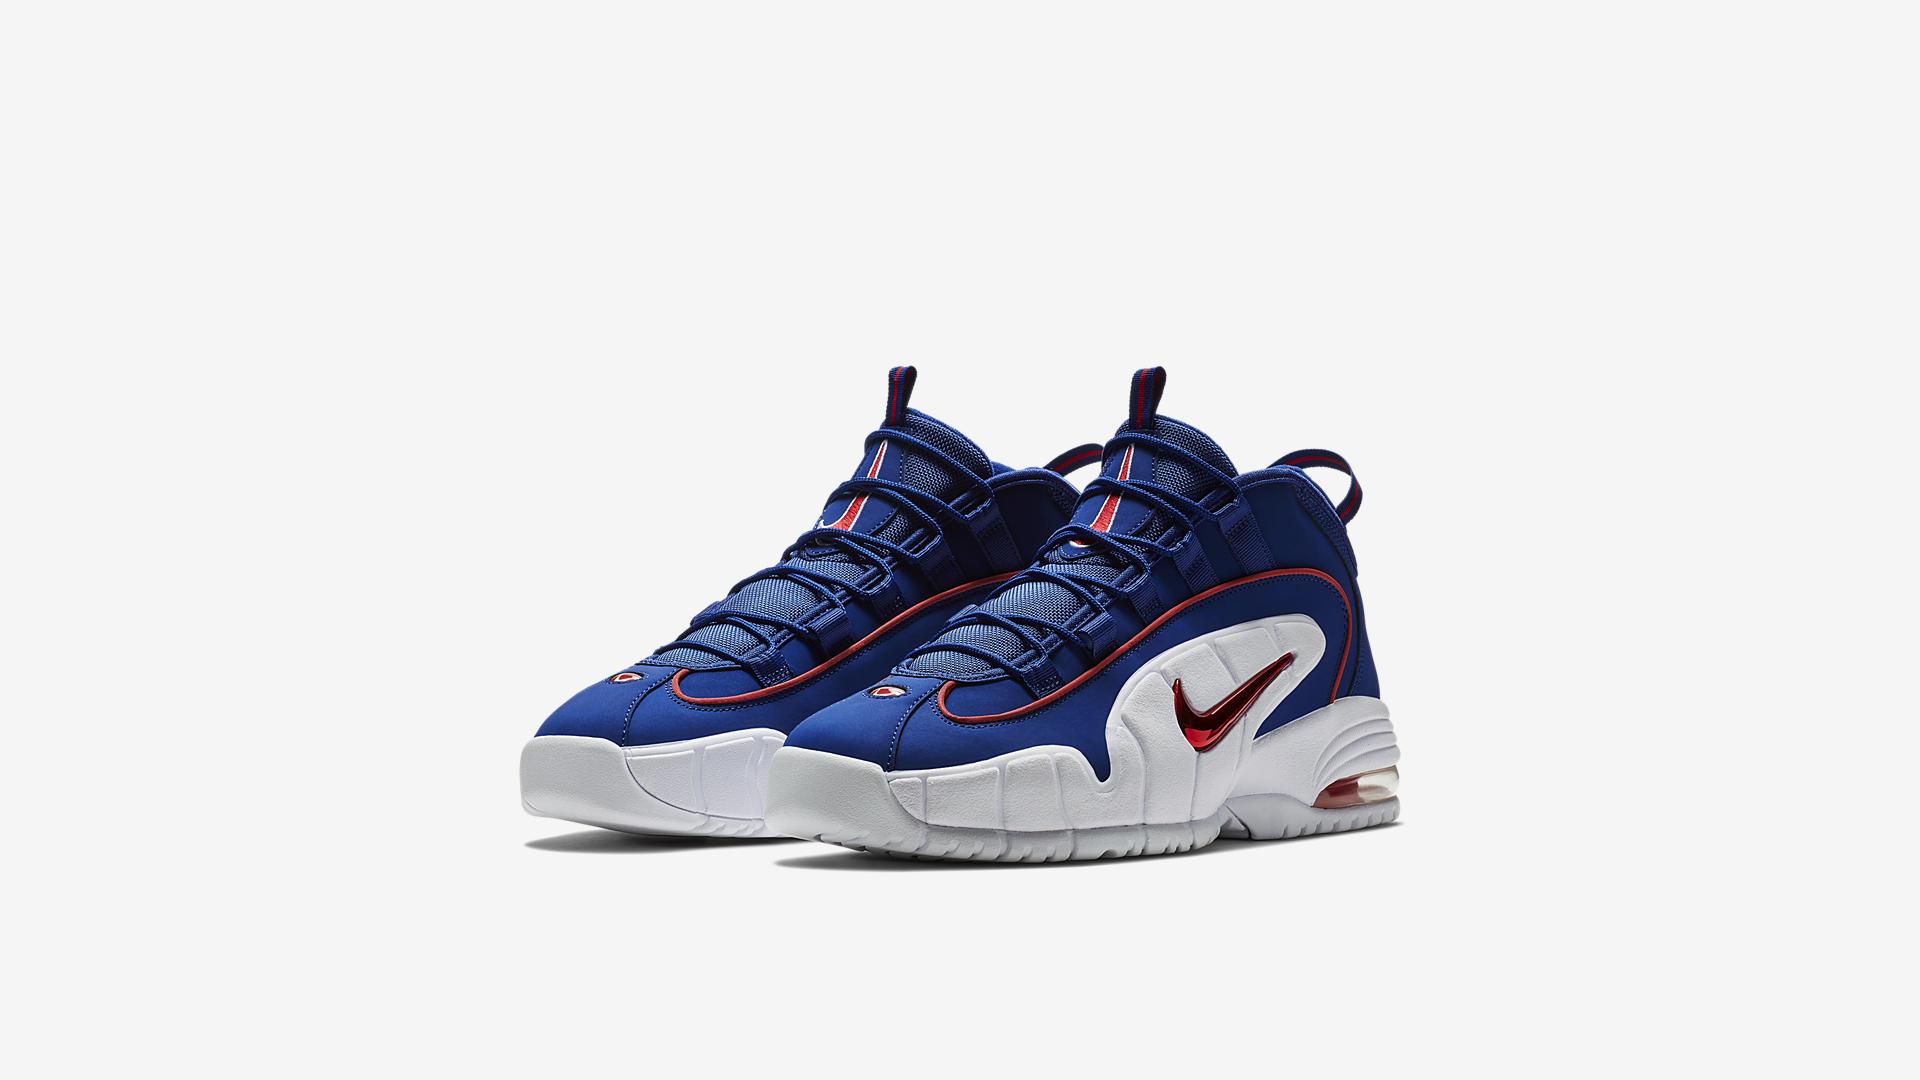 Nike Air Max Penny 685153-400